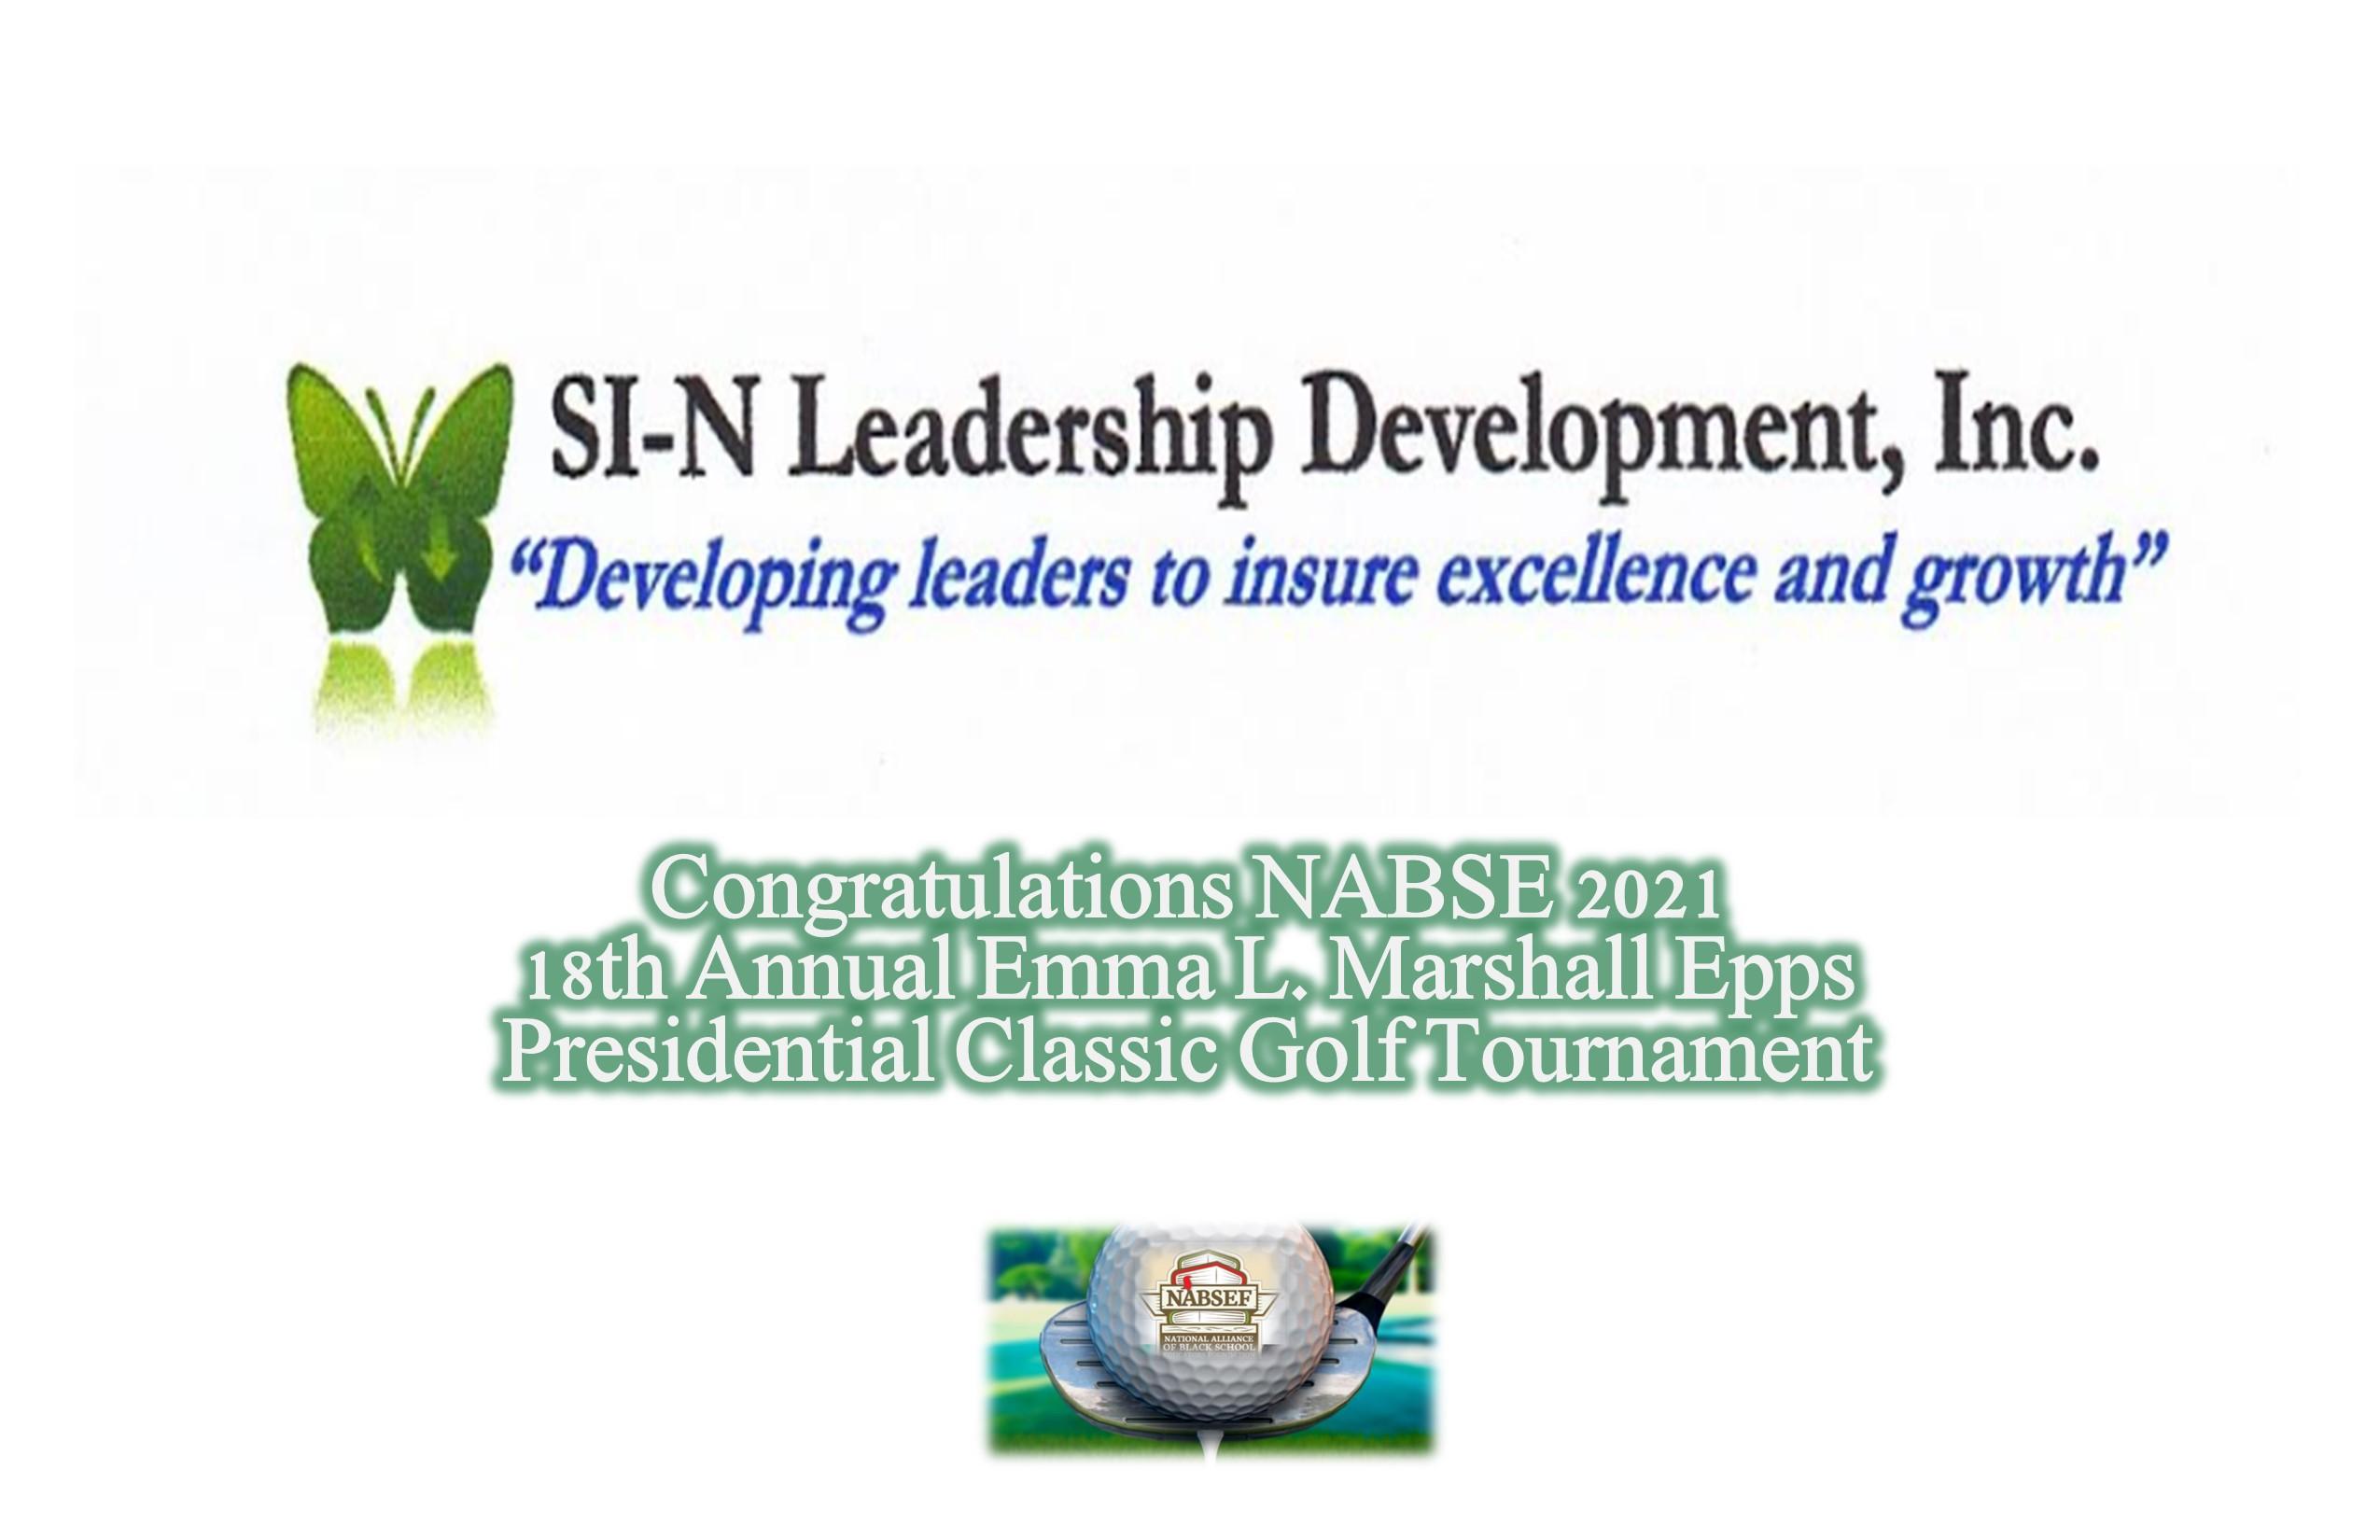 SI-N Leadership Development, Inc.